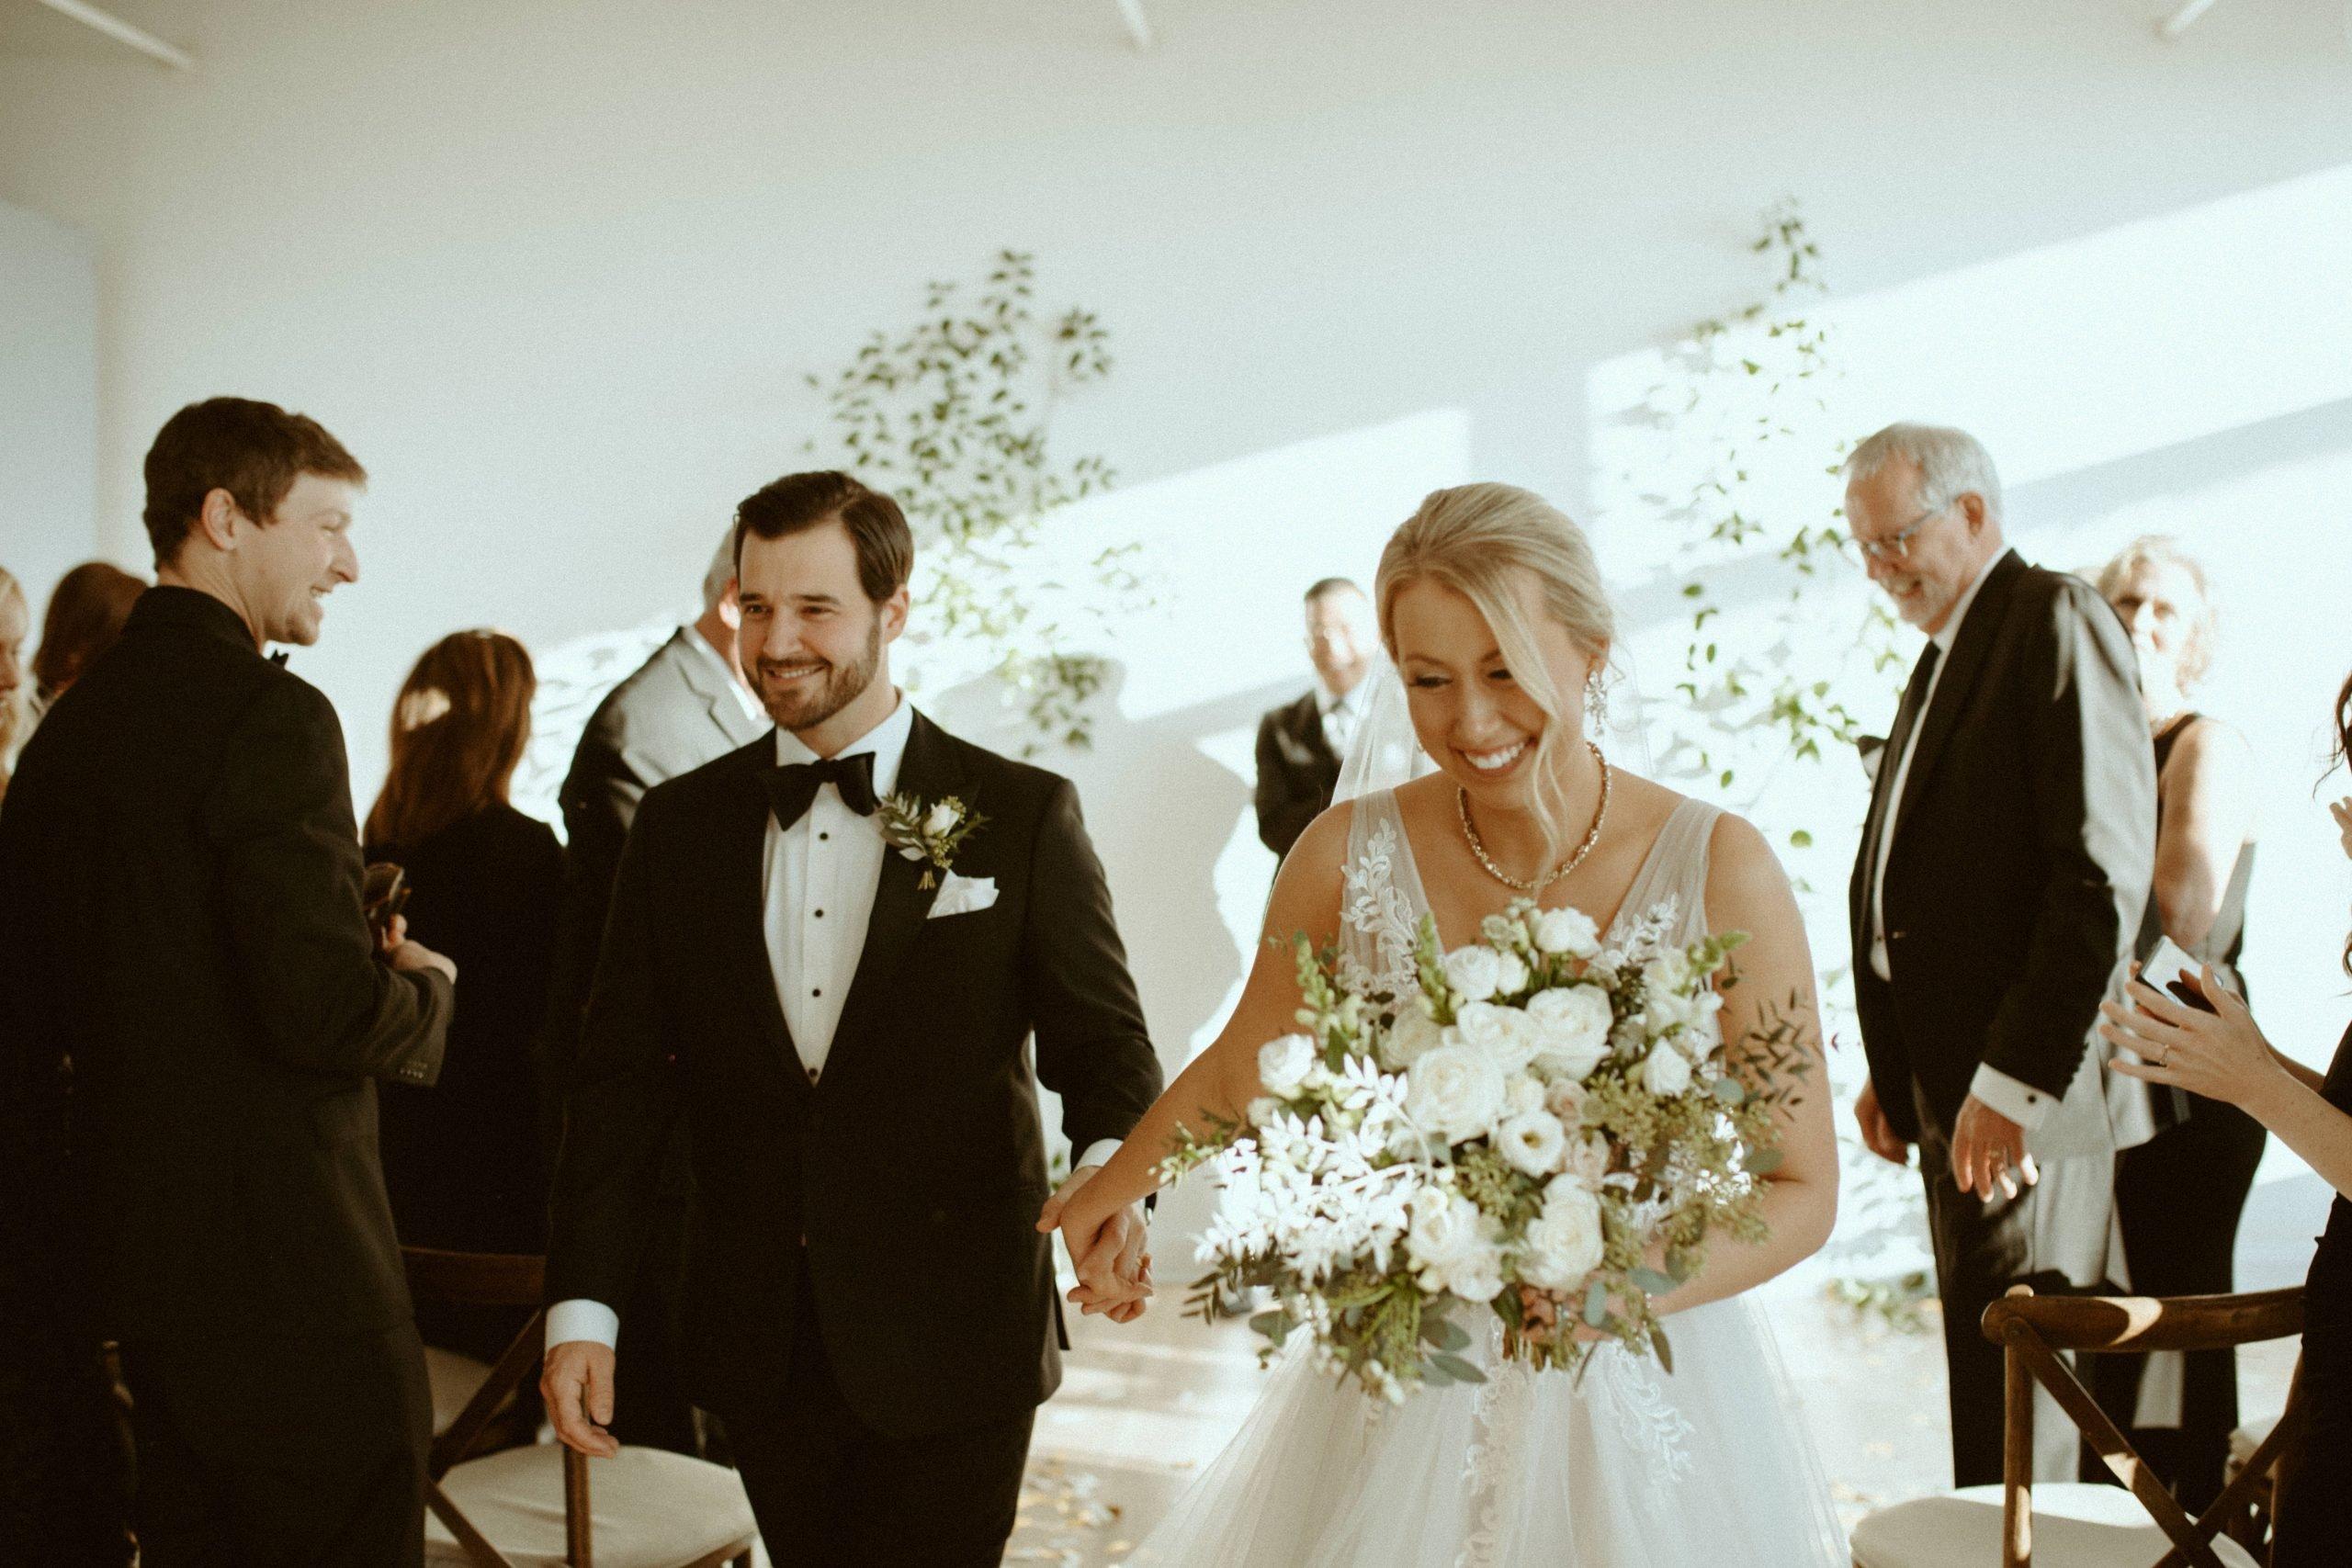 The Lumen Room, The Lumen Room Wedding, Intimate Wedding at the Lumen Room, Dallas Wedding, Dallas Wedding Photographer, Texas Wedding, Texas Wedding Photographer, Texas Destination Photographer, Texas Elopement Photographer, Elopement, Howell & Dragon Wedding, Austin Wedding, Austin Wedding Photographer